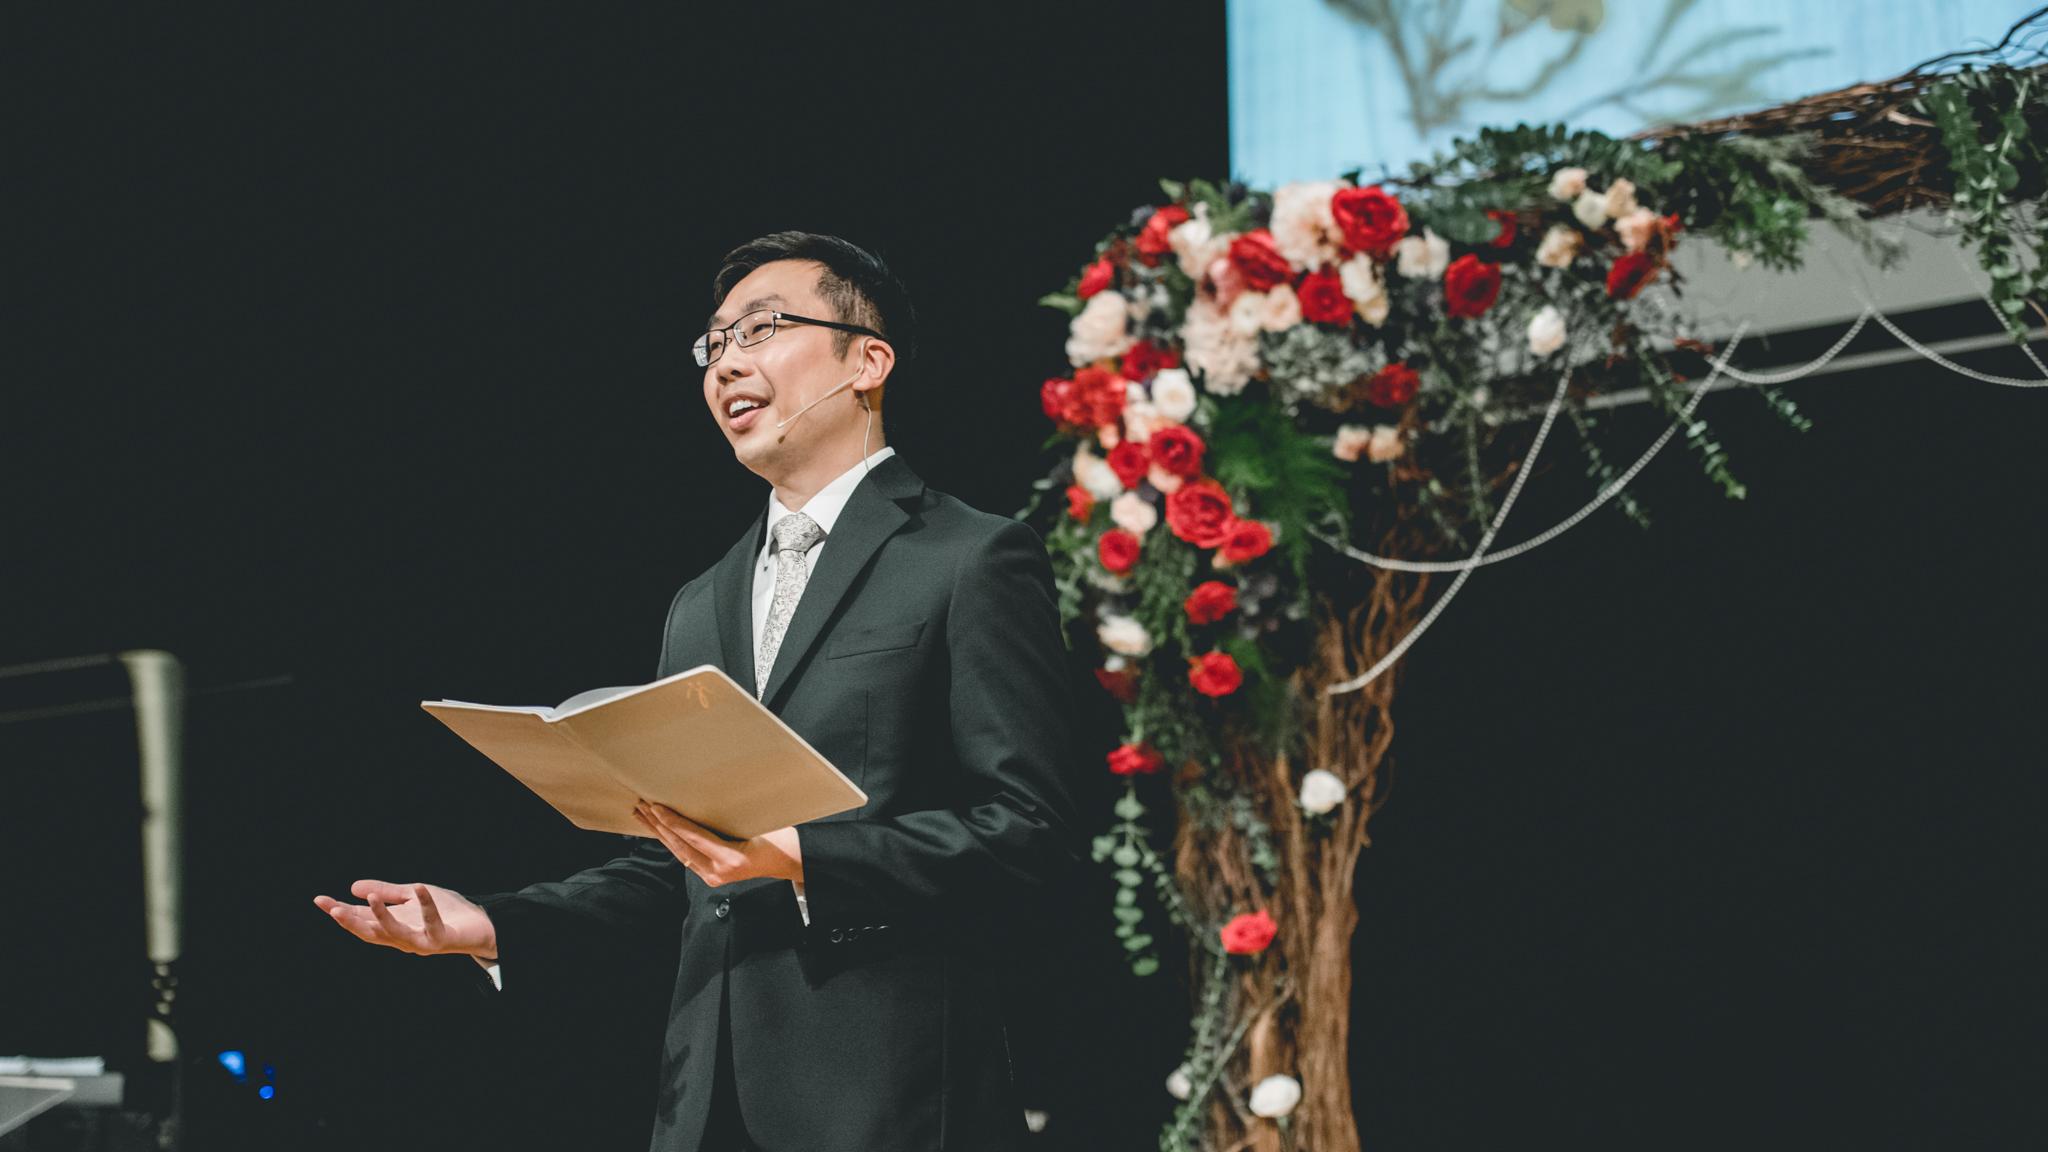 Church Wedding Bethel 00086.JPG